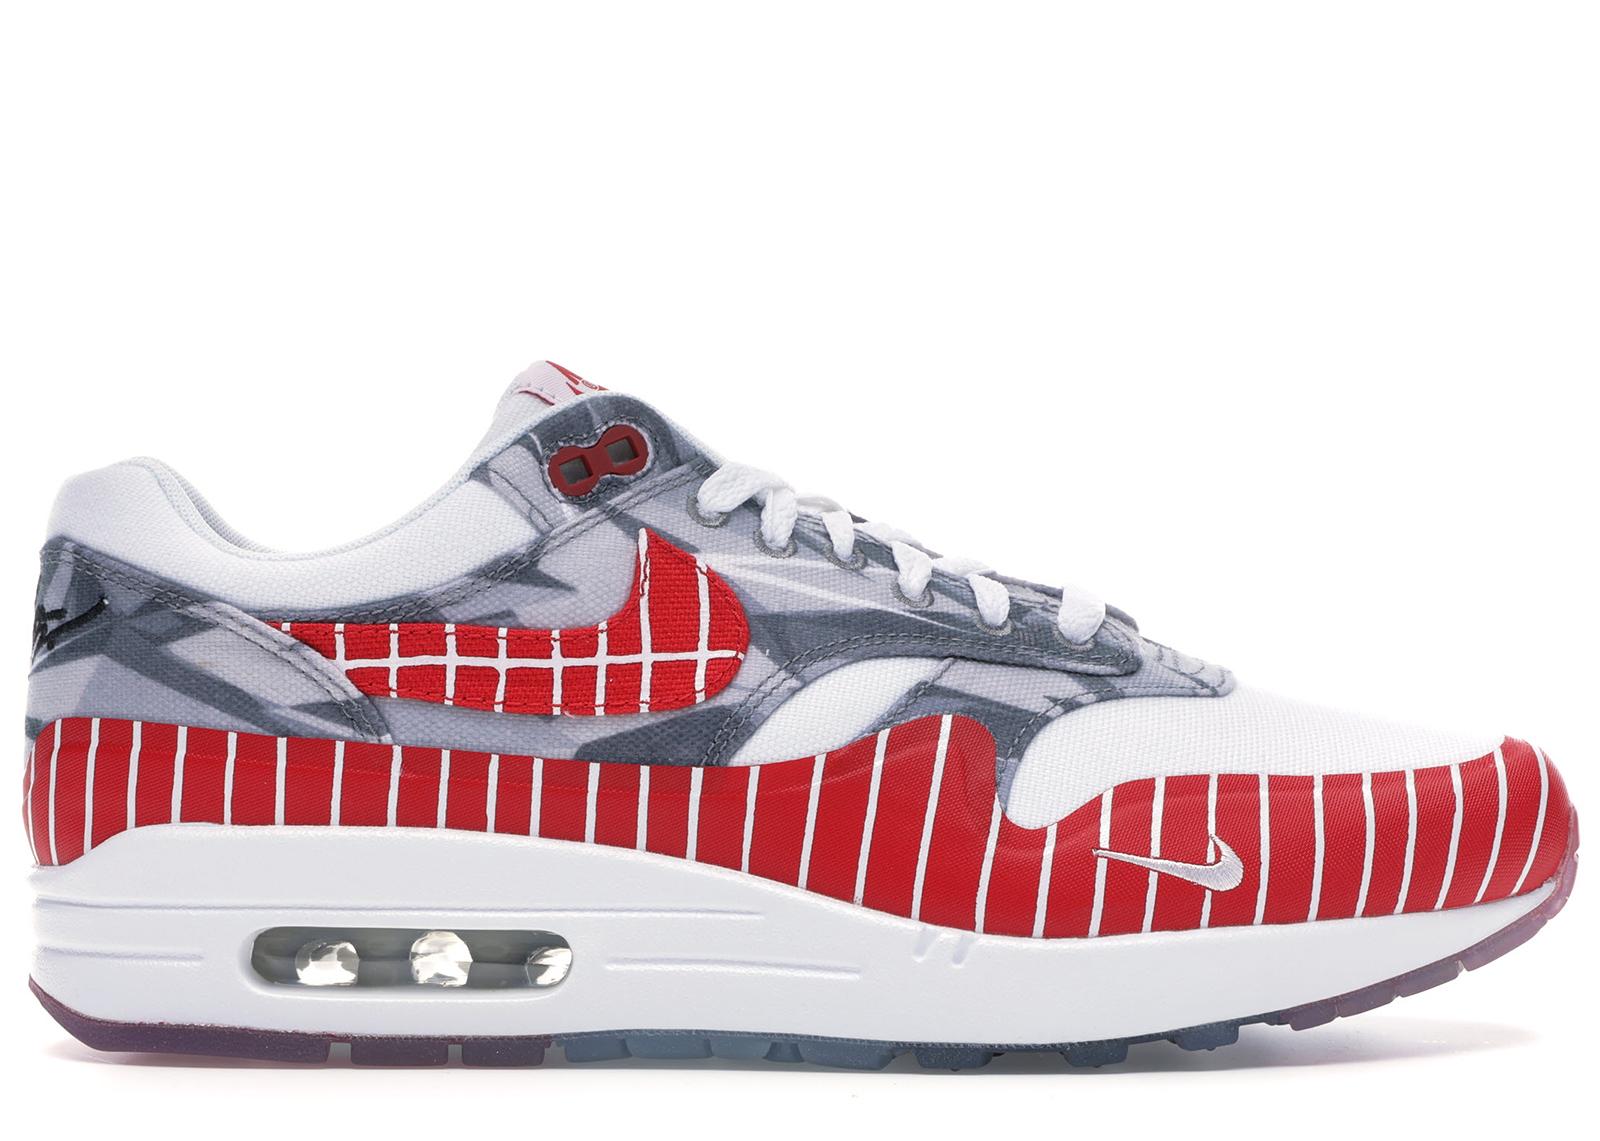 Nike Air Max 1 x Wasafu Los Primeros